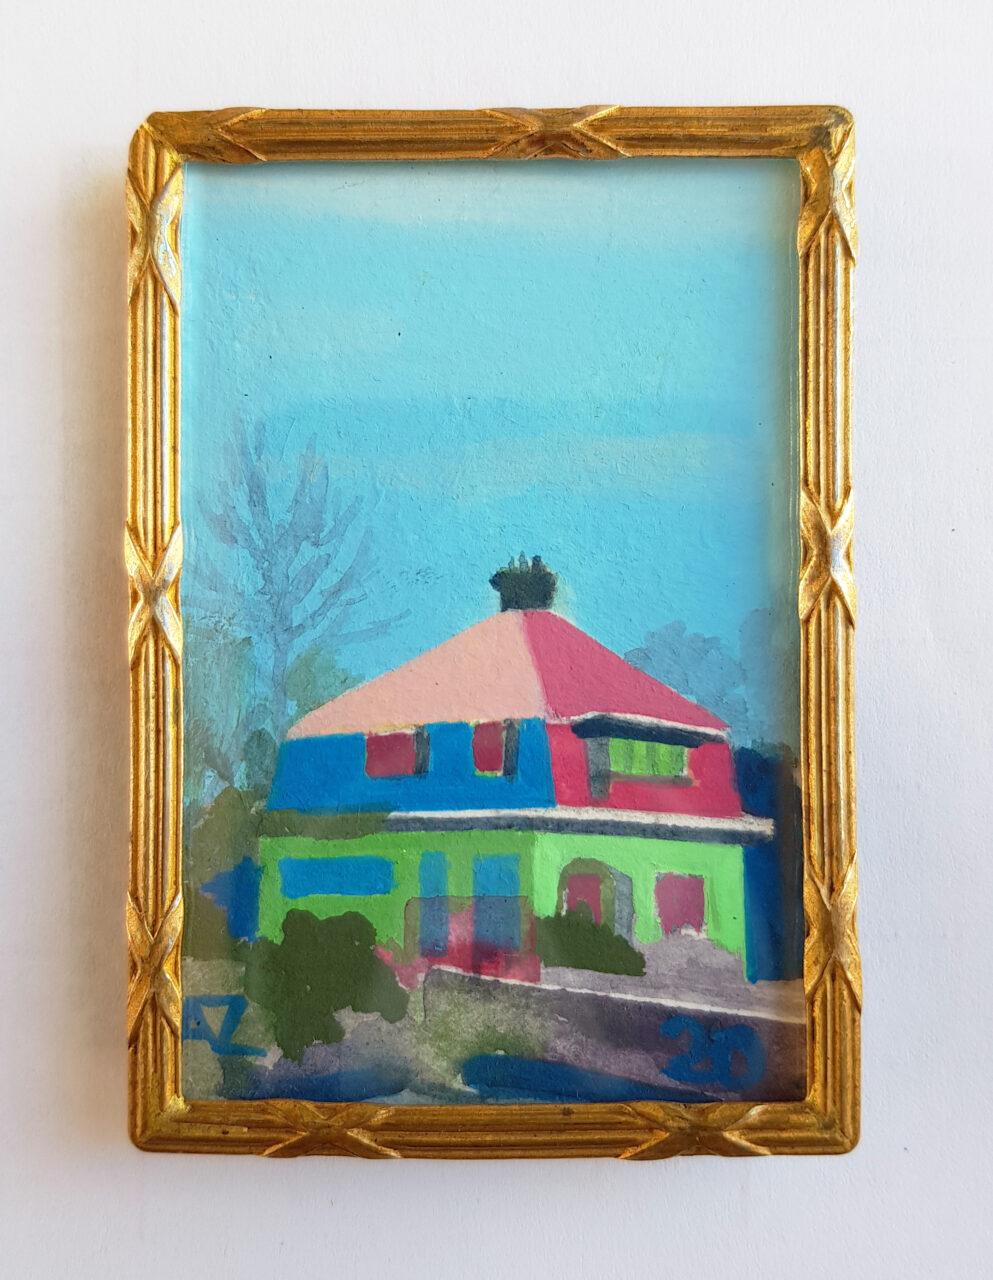 Mini painting in an antique 1921 frame. Title: Huis aan de Reeweg 2021, vinyl paint on paper, 6,5x4,5cm.